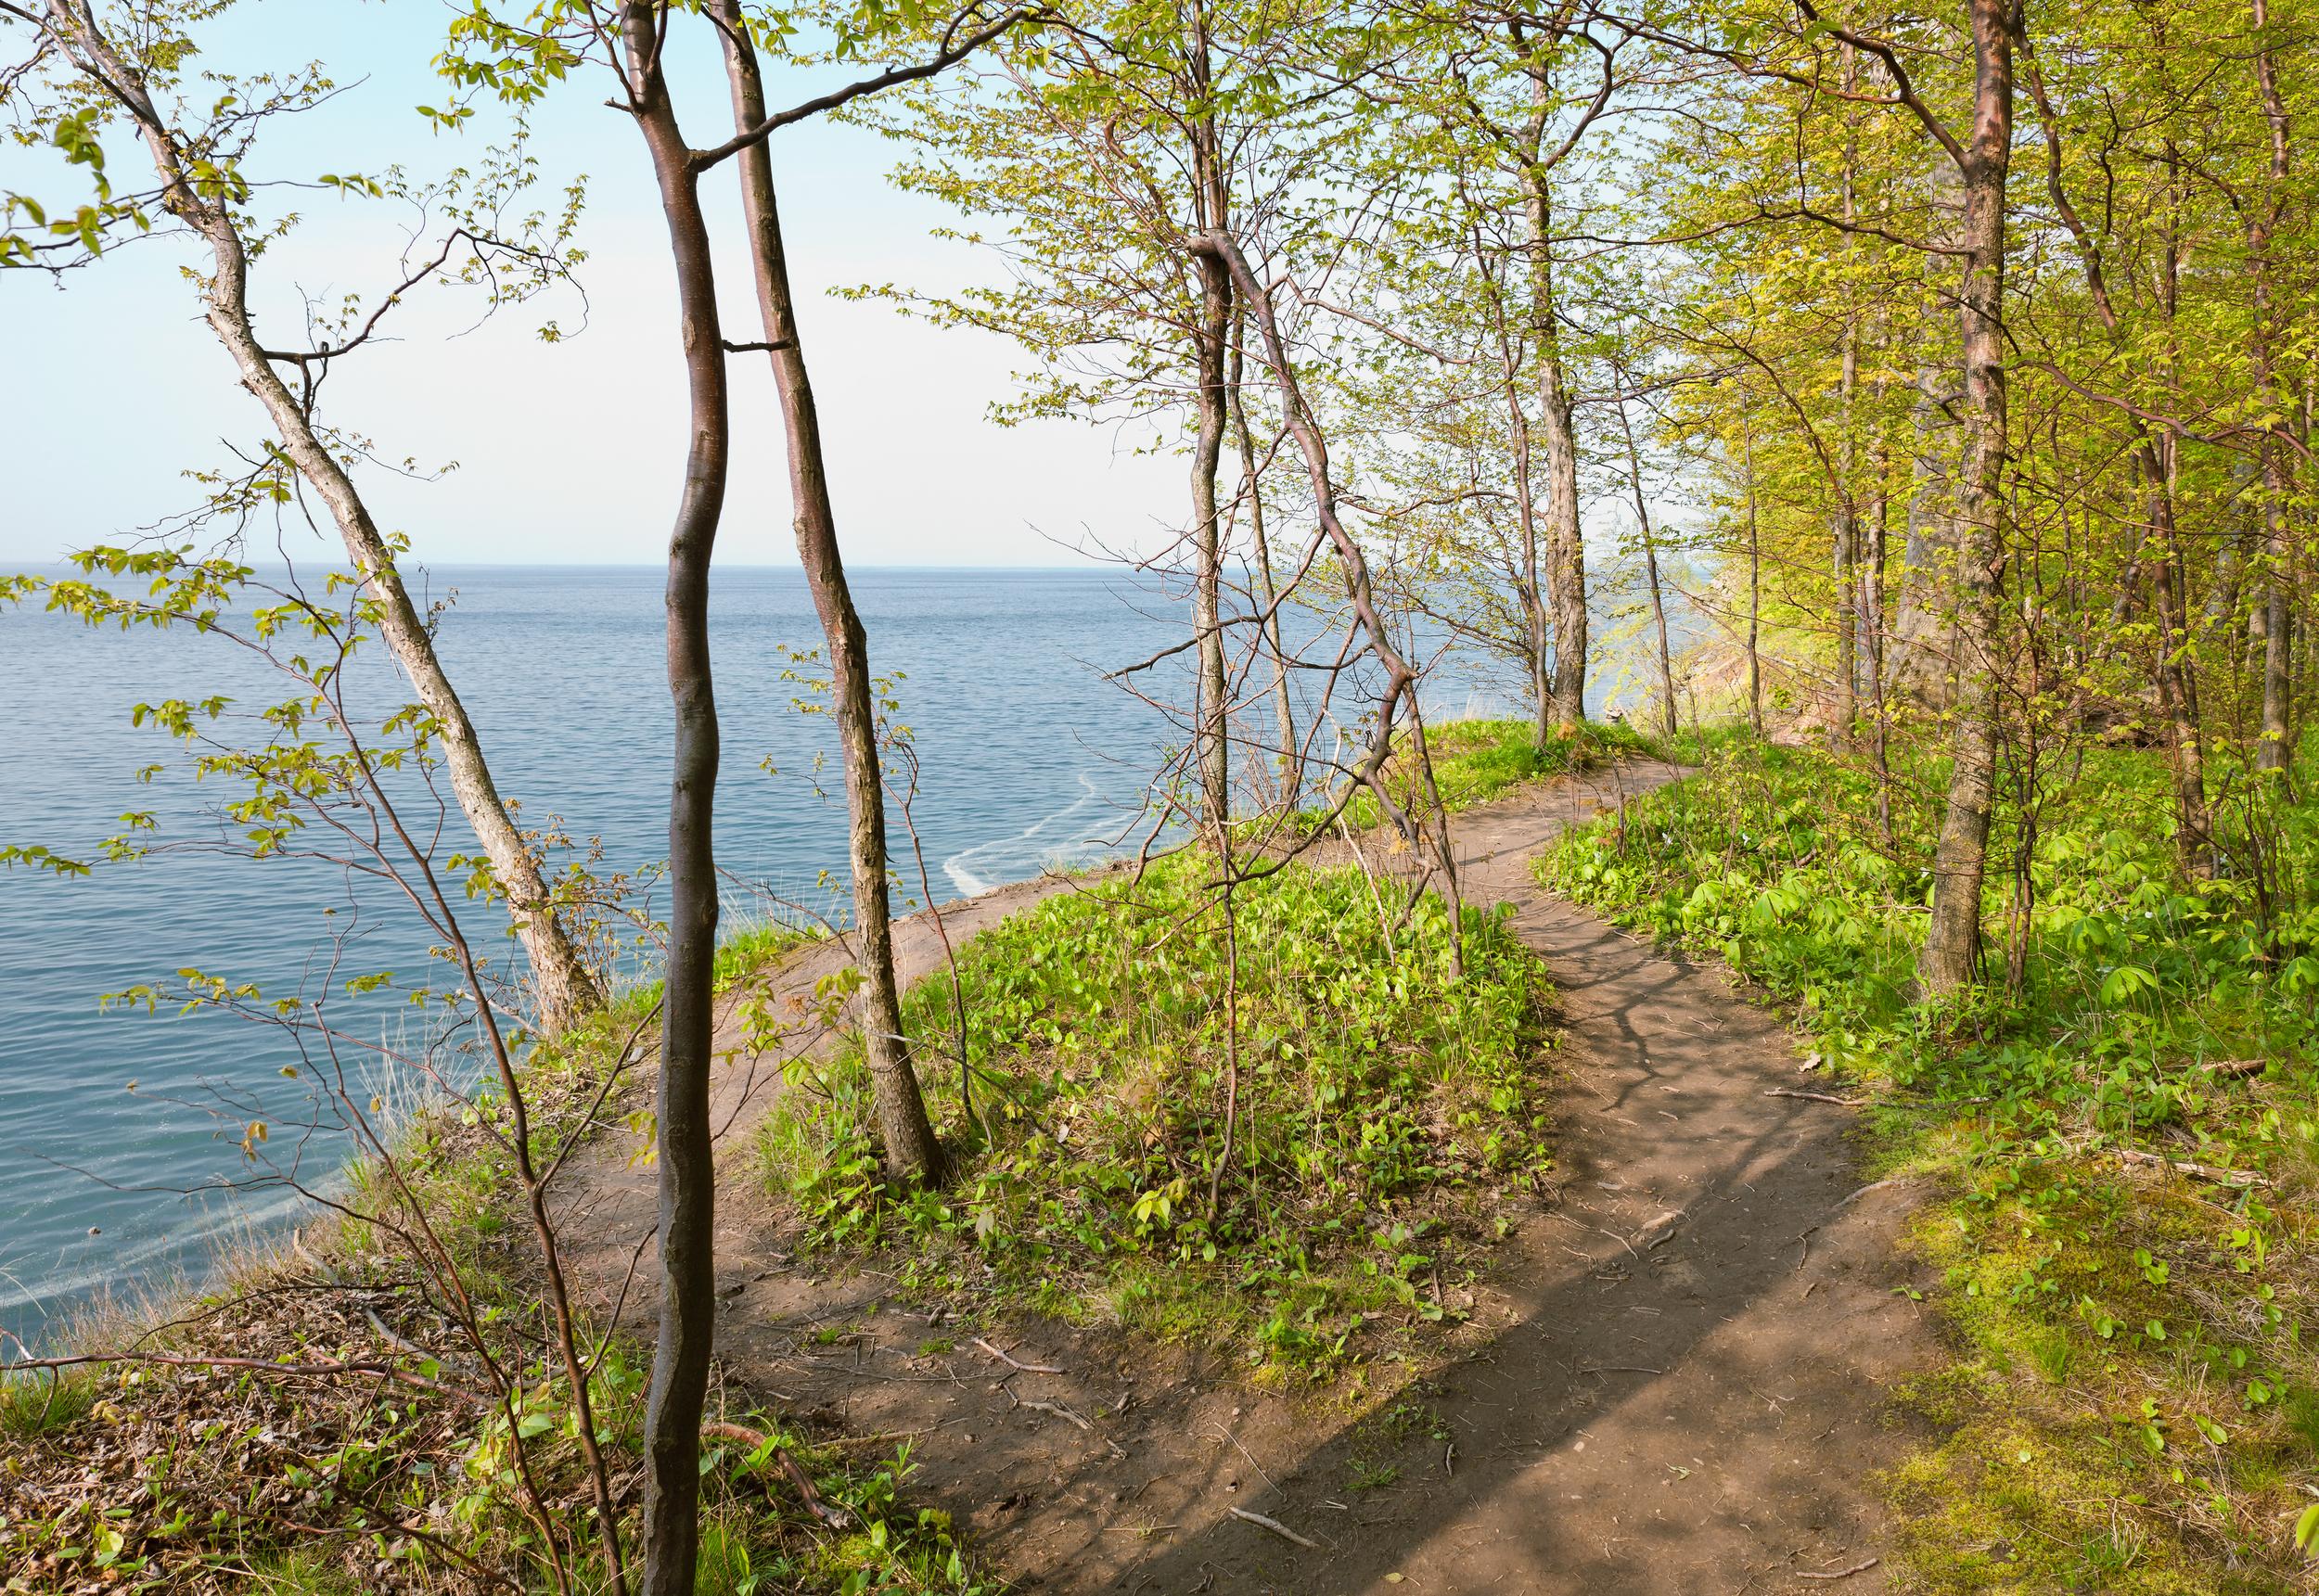 Hikers' Path, Lake Ontario Shoreline at Chimney Bluffs